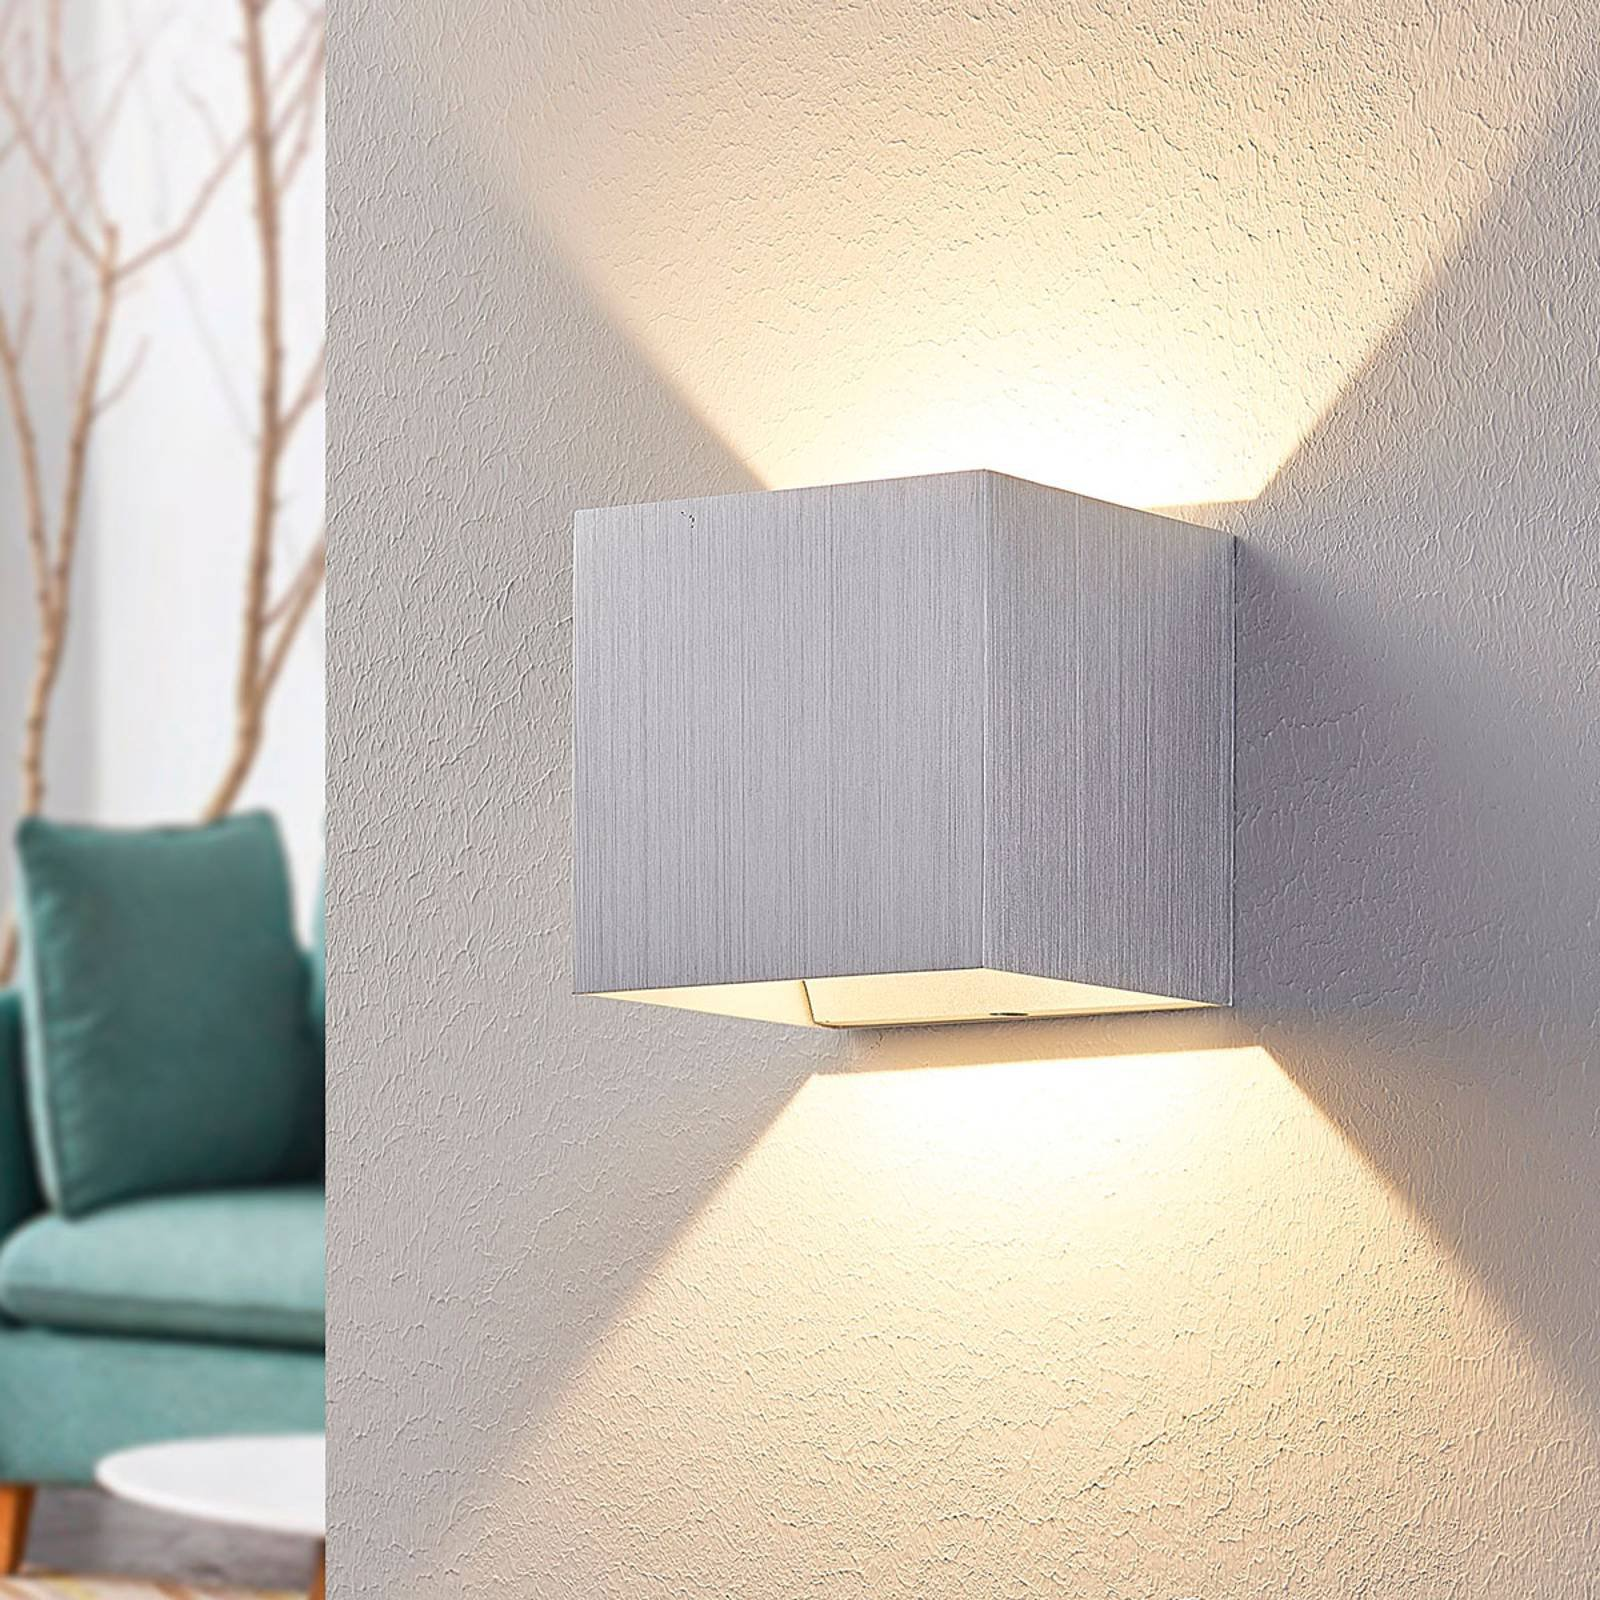 LED-vegglampe Esma i aluminium, firkantet